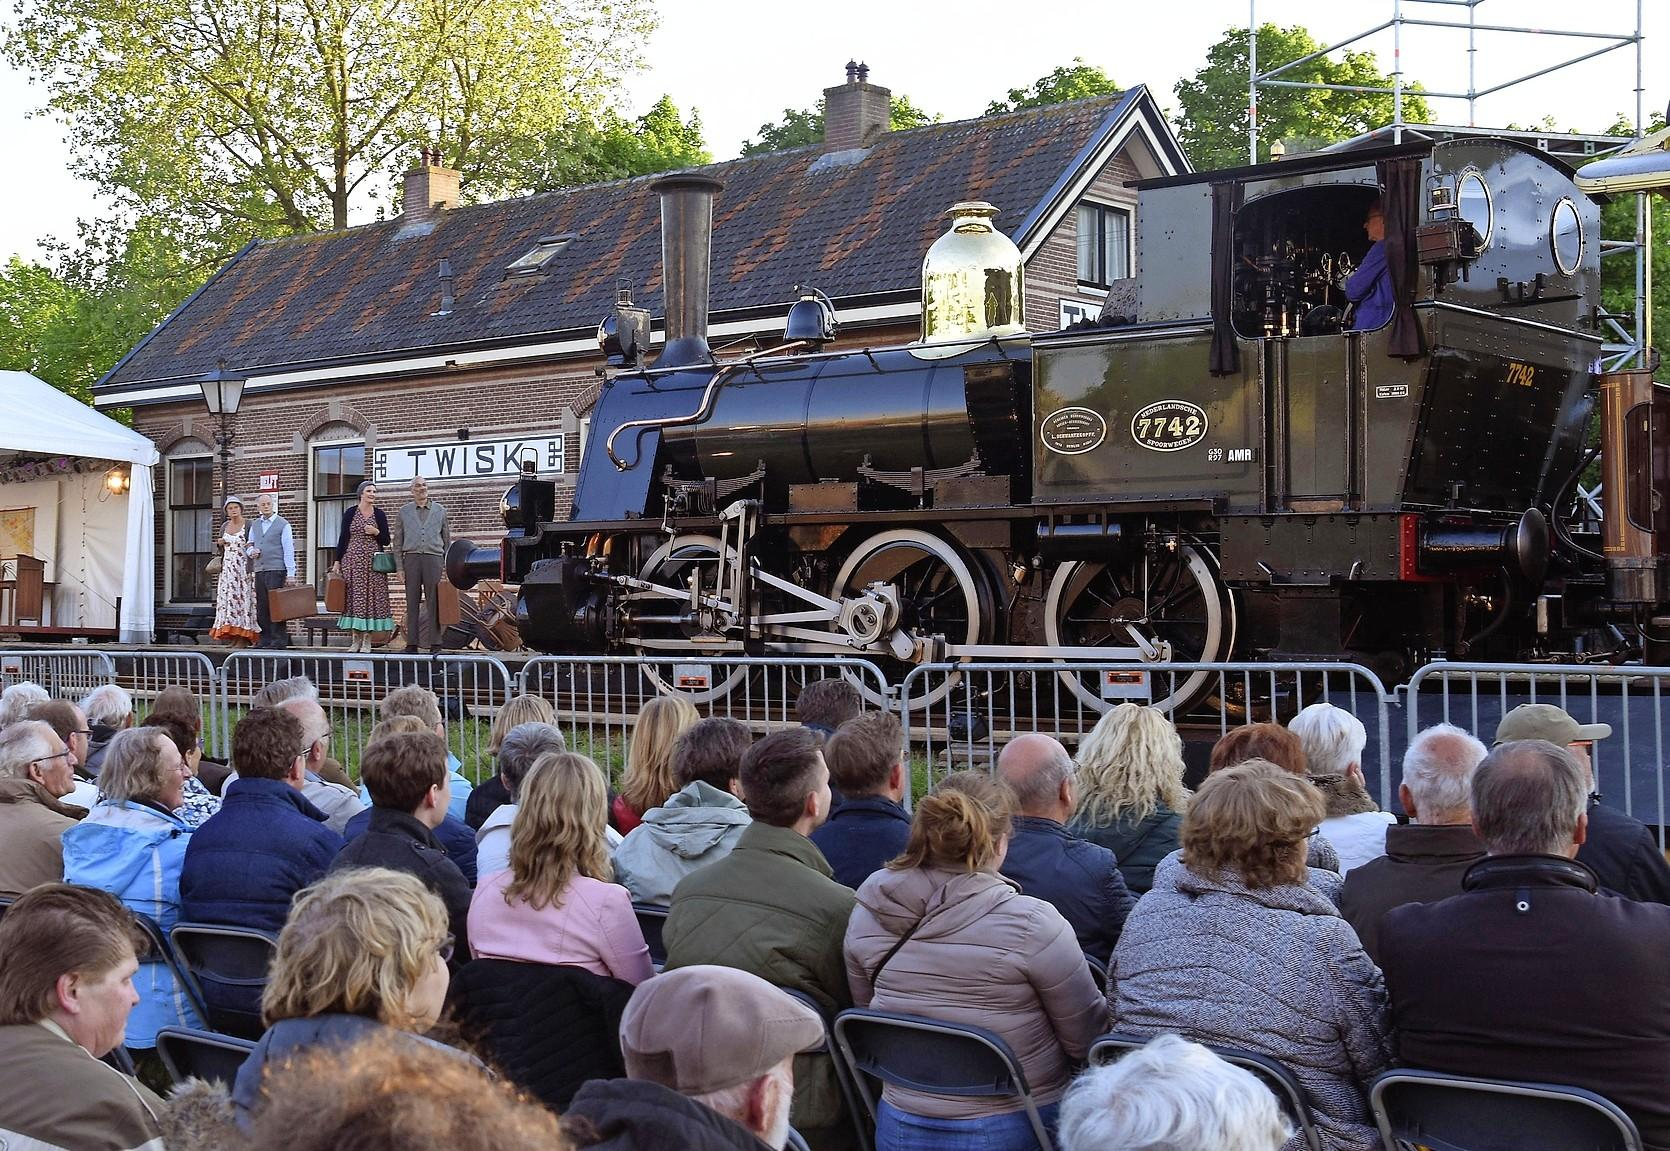 Ot en Sien-festival verhuist naar Hoorn